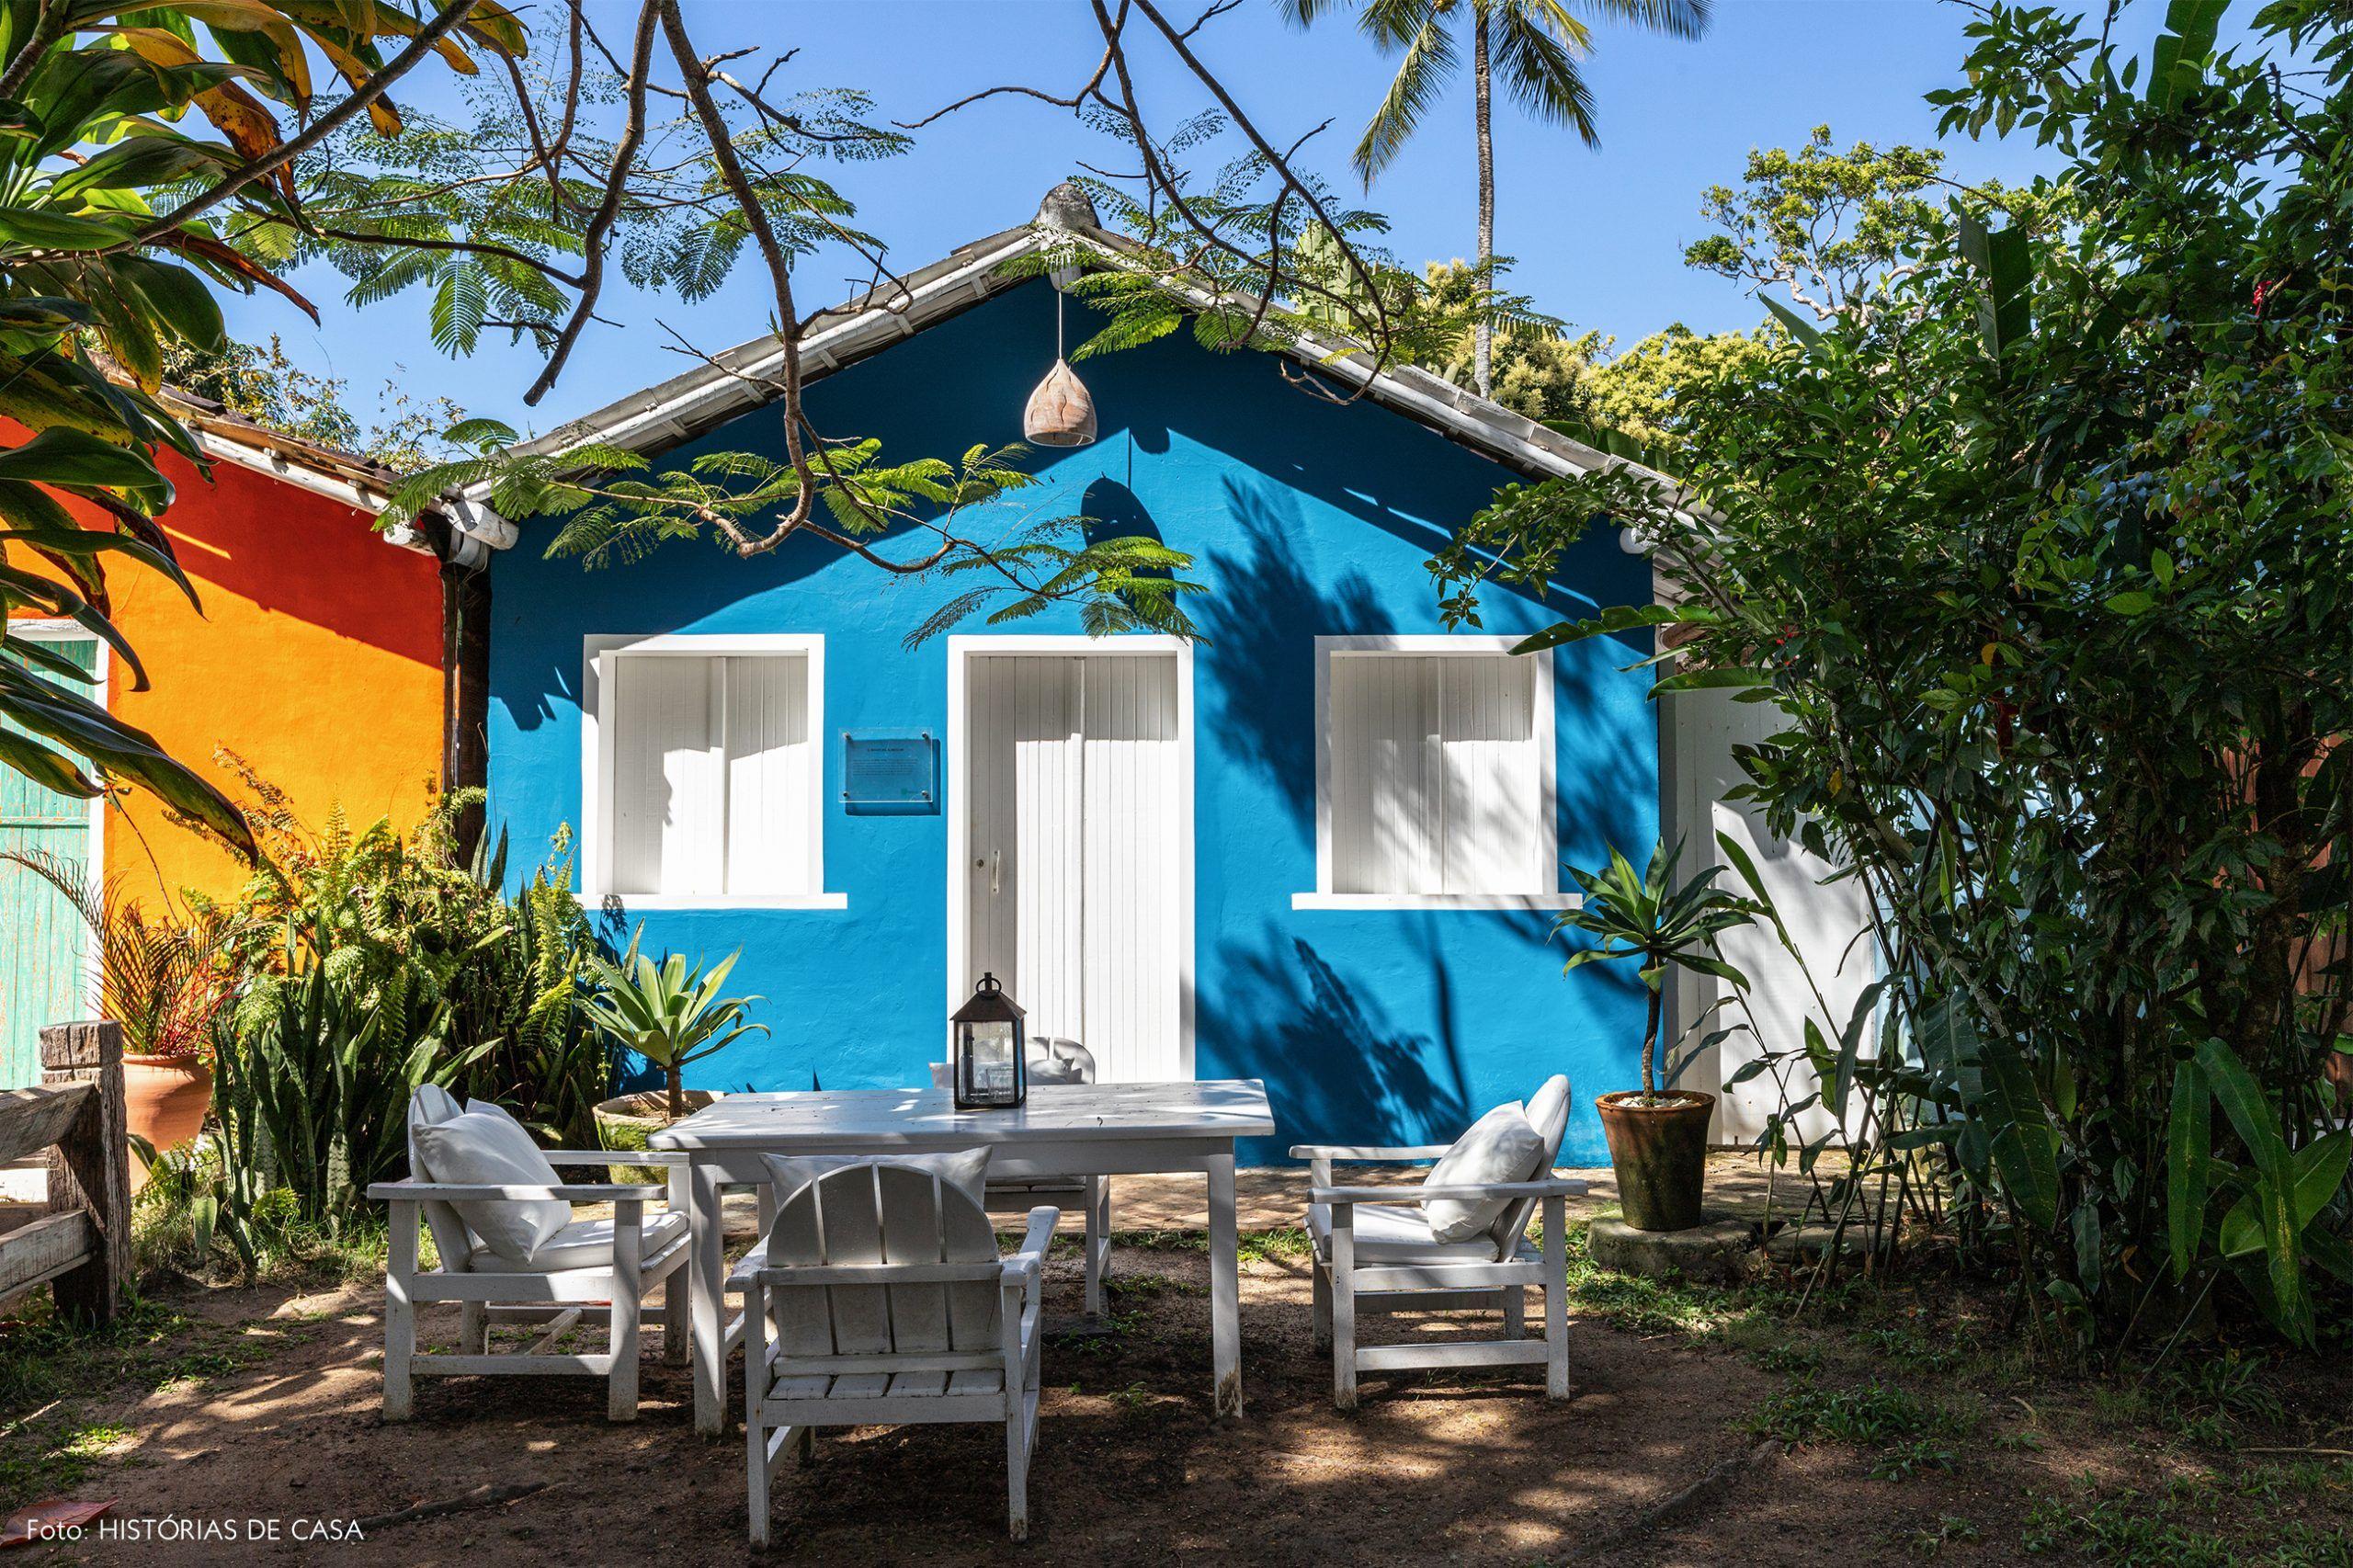 Fotos de casas de madeira pintadas